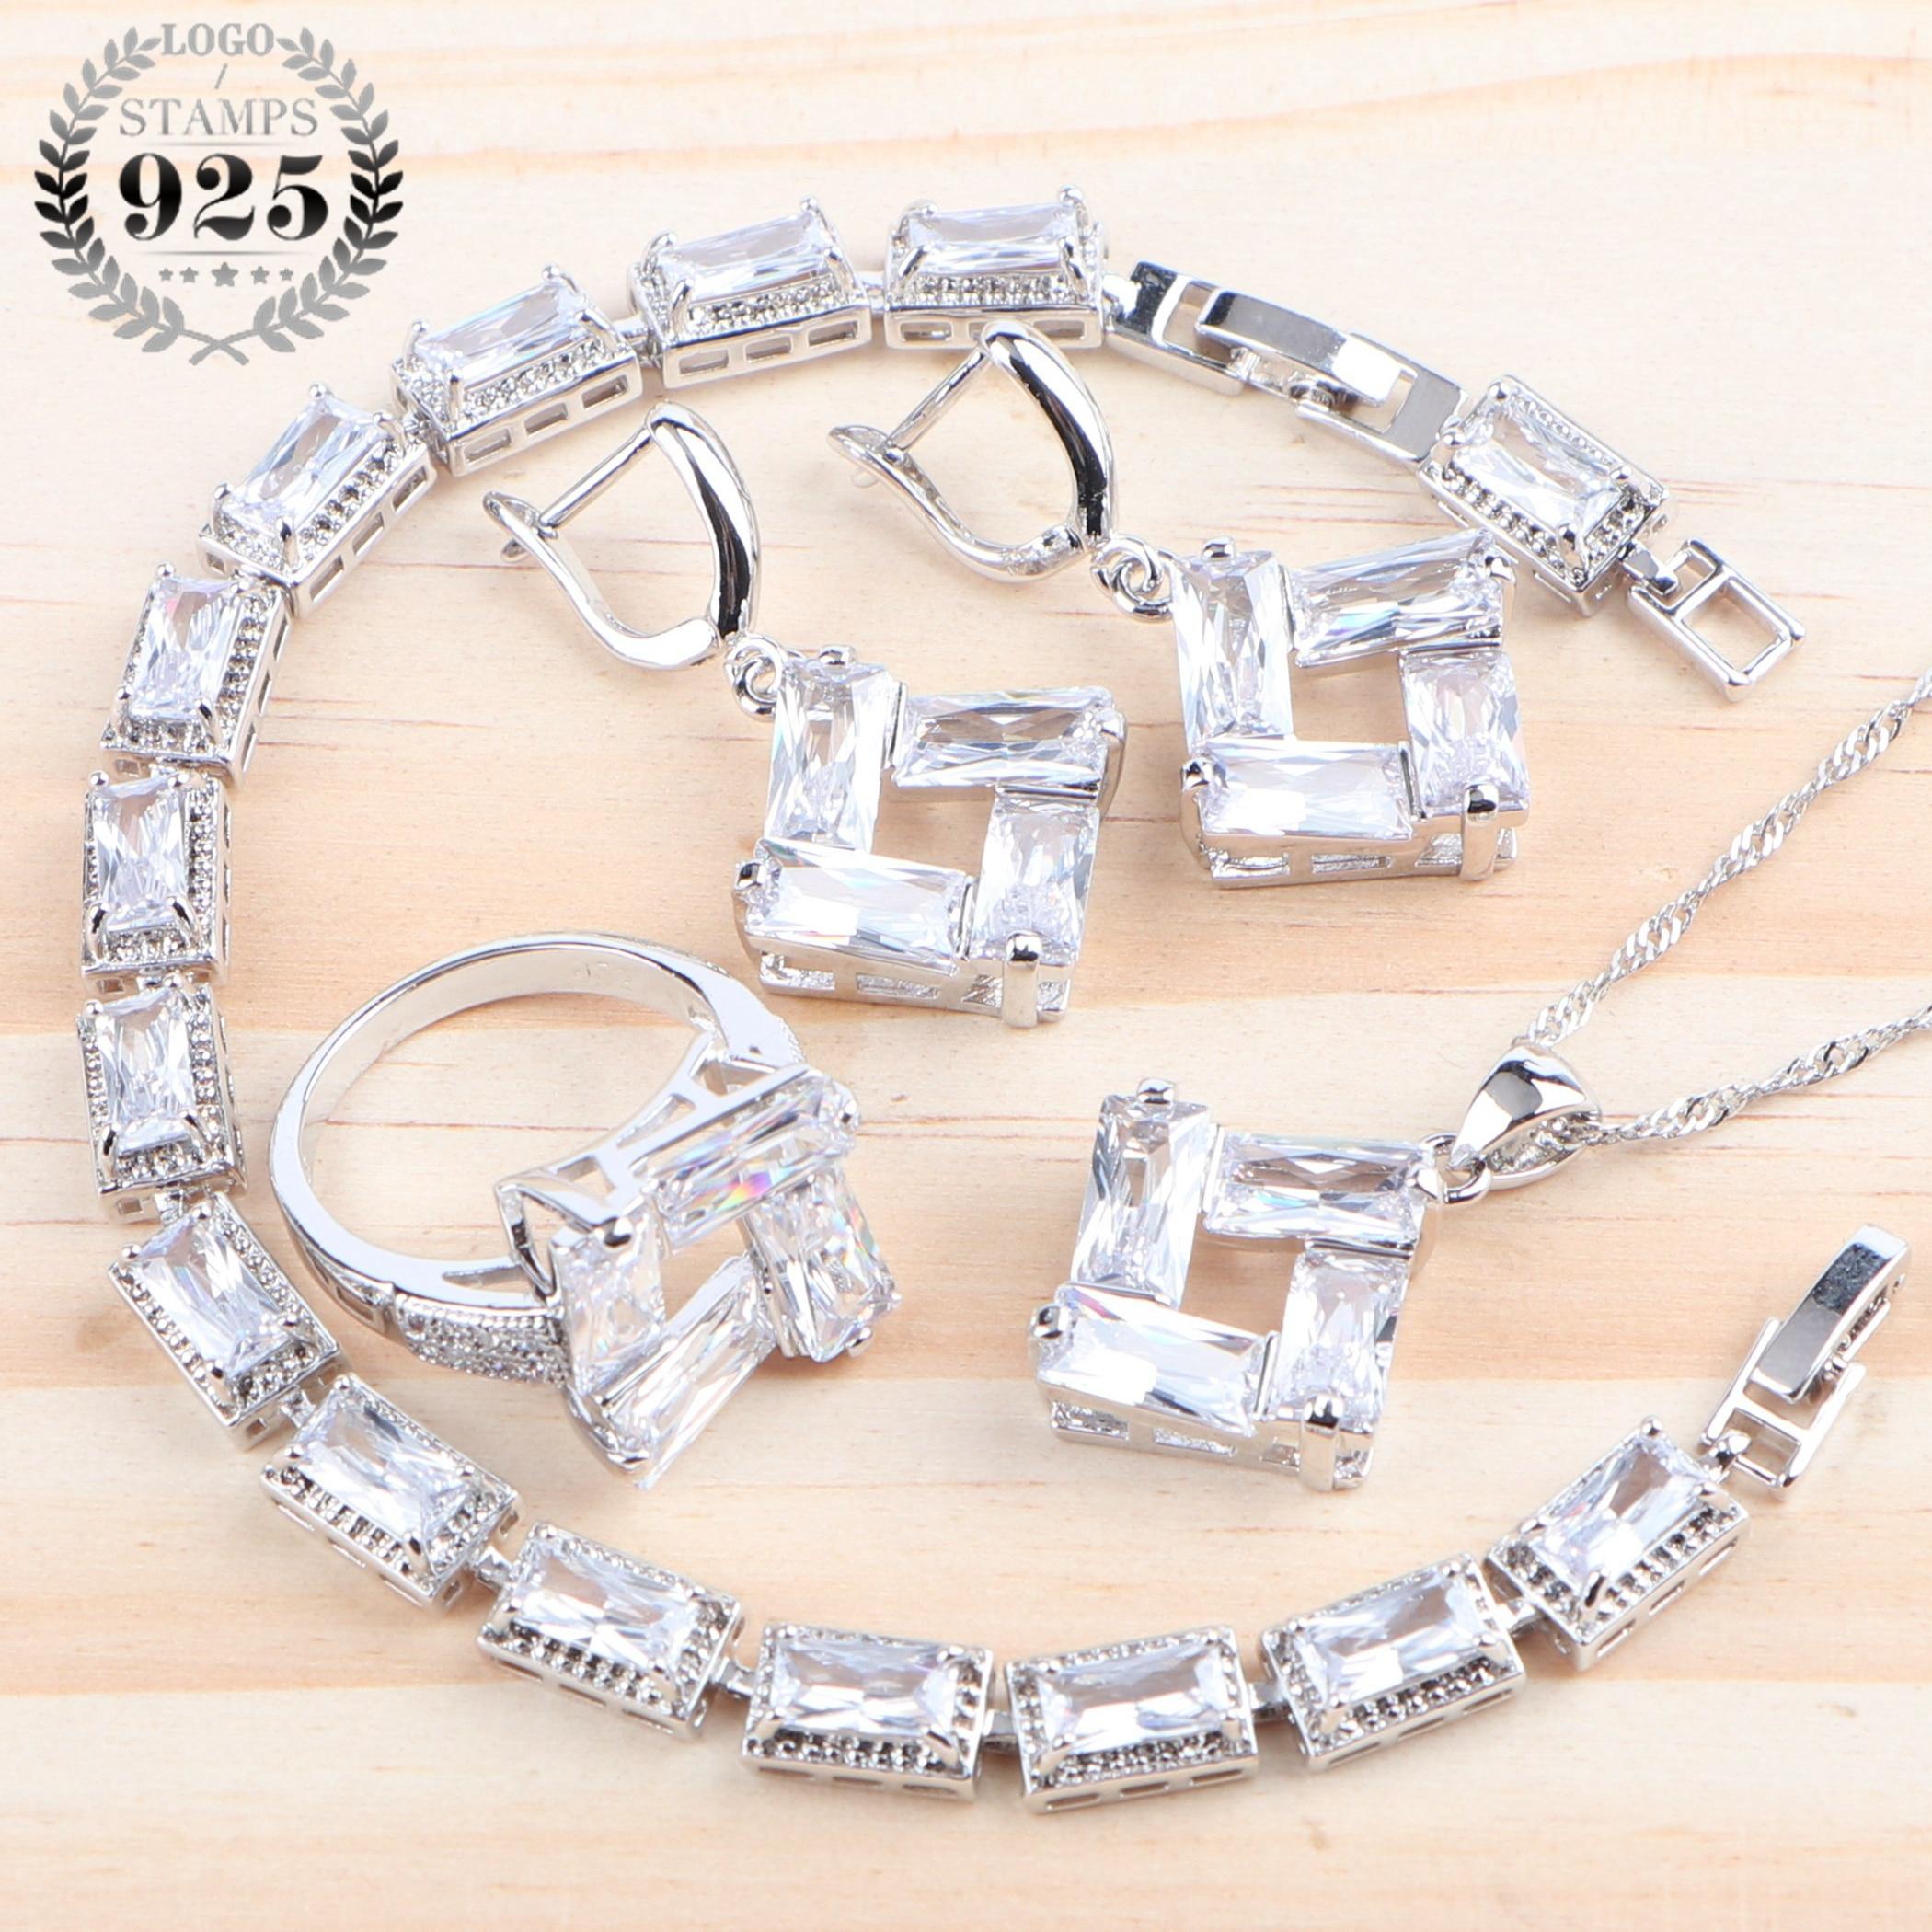 Wedding Cubic Zirconia Women Luxury Jewelry Sets 925 Sterling Silver White Ring Bracelet Earrings Pendant Necklace Set Gifts Box